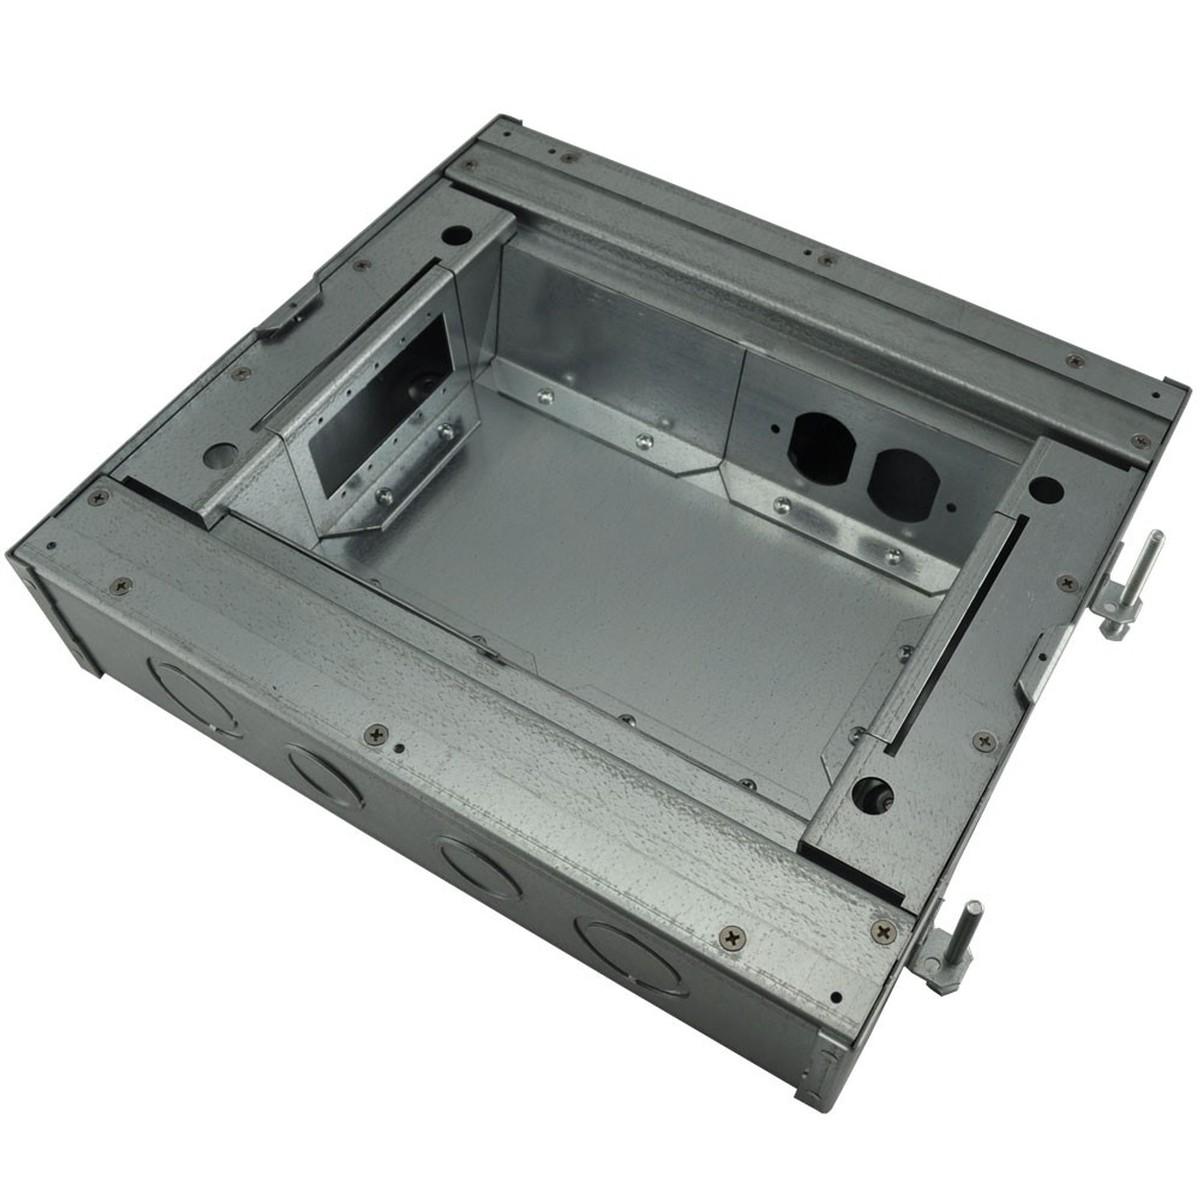 Fsr Fl 600p 3 B Ul Amp Cul Concrete Floor Box 3 Quot Deep 6x1